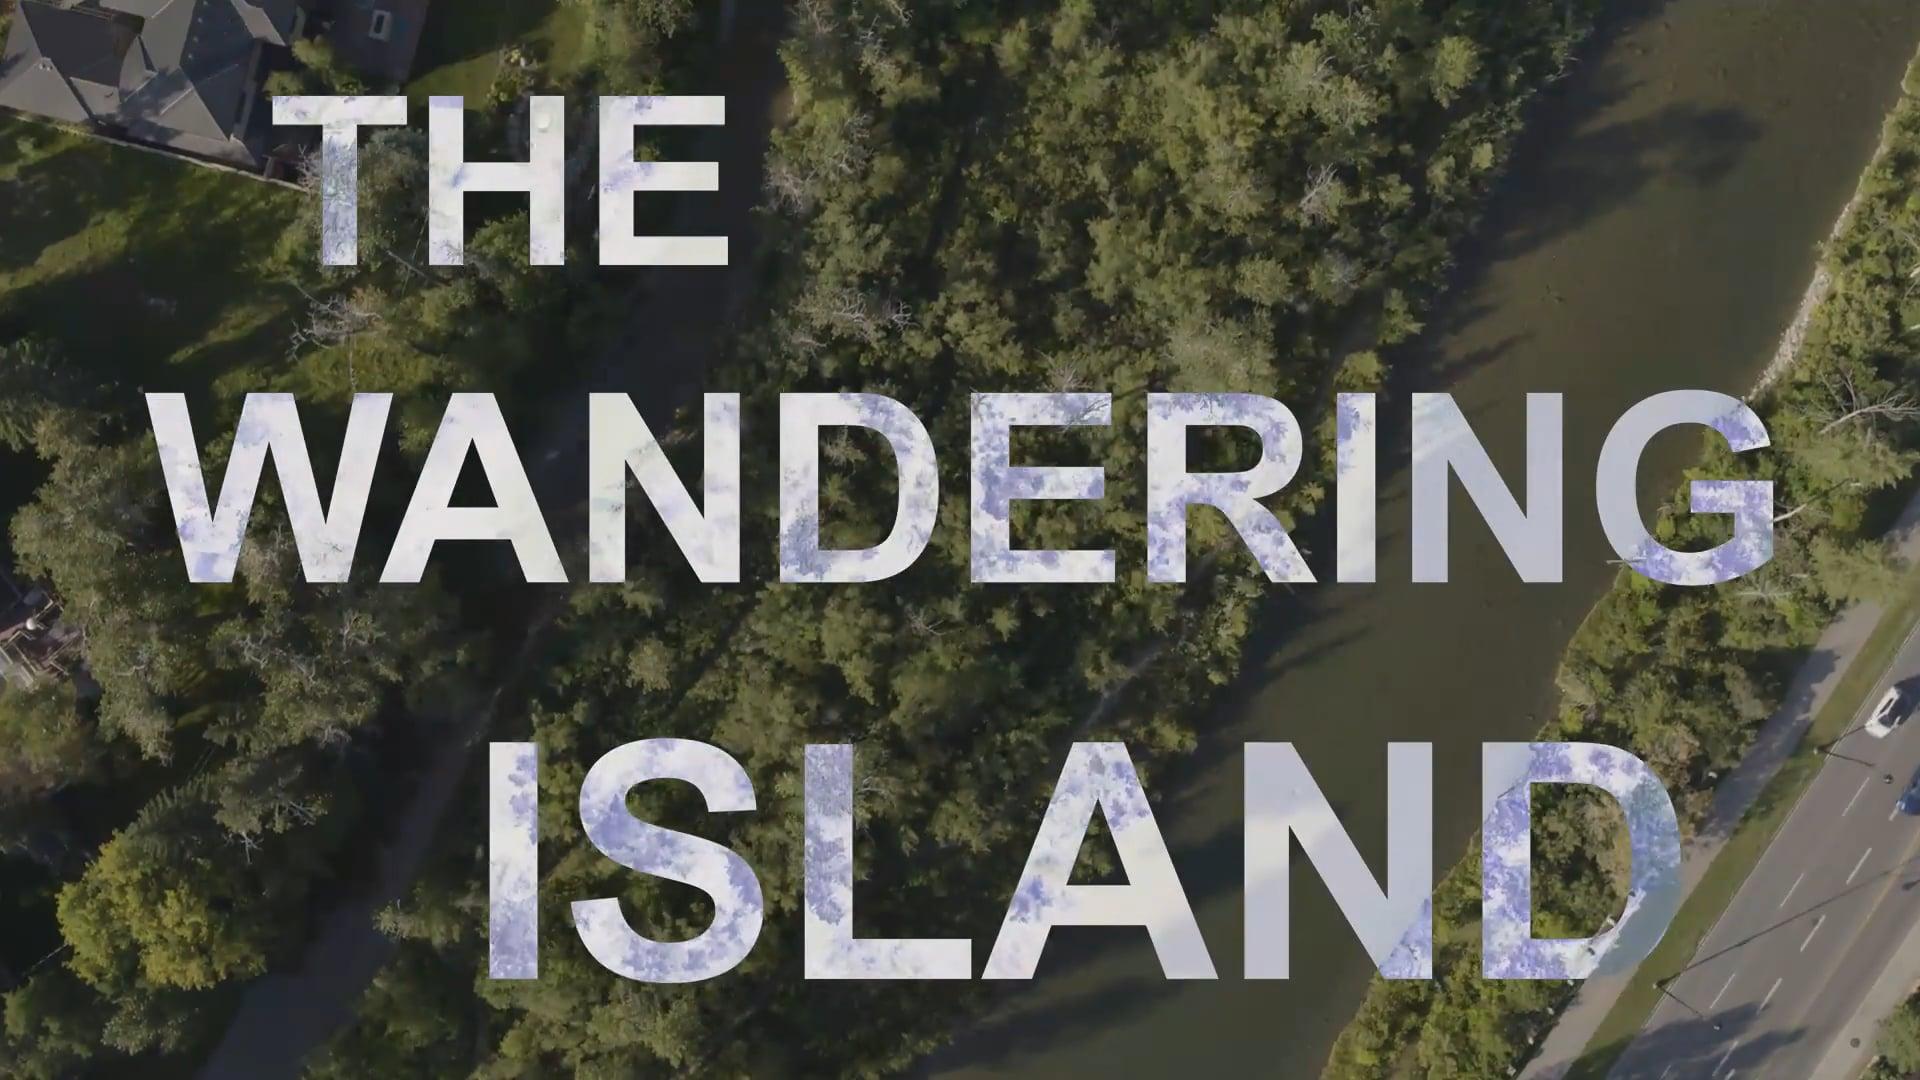 The Wandering Island: An invitation